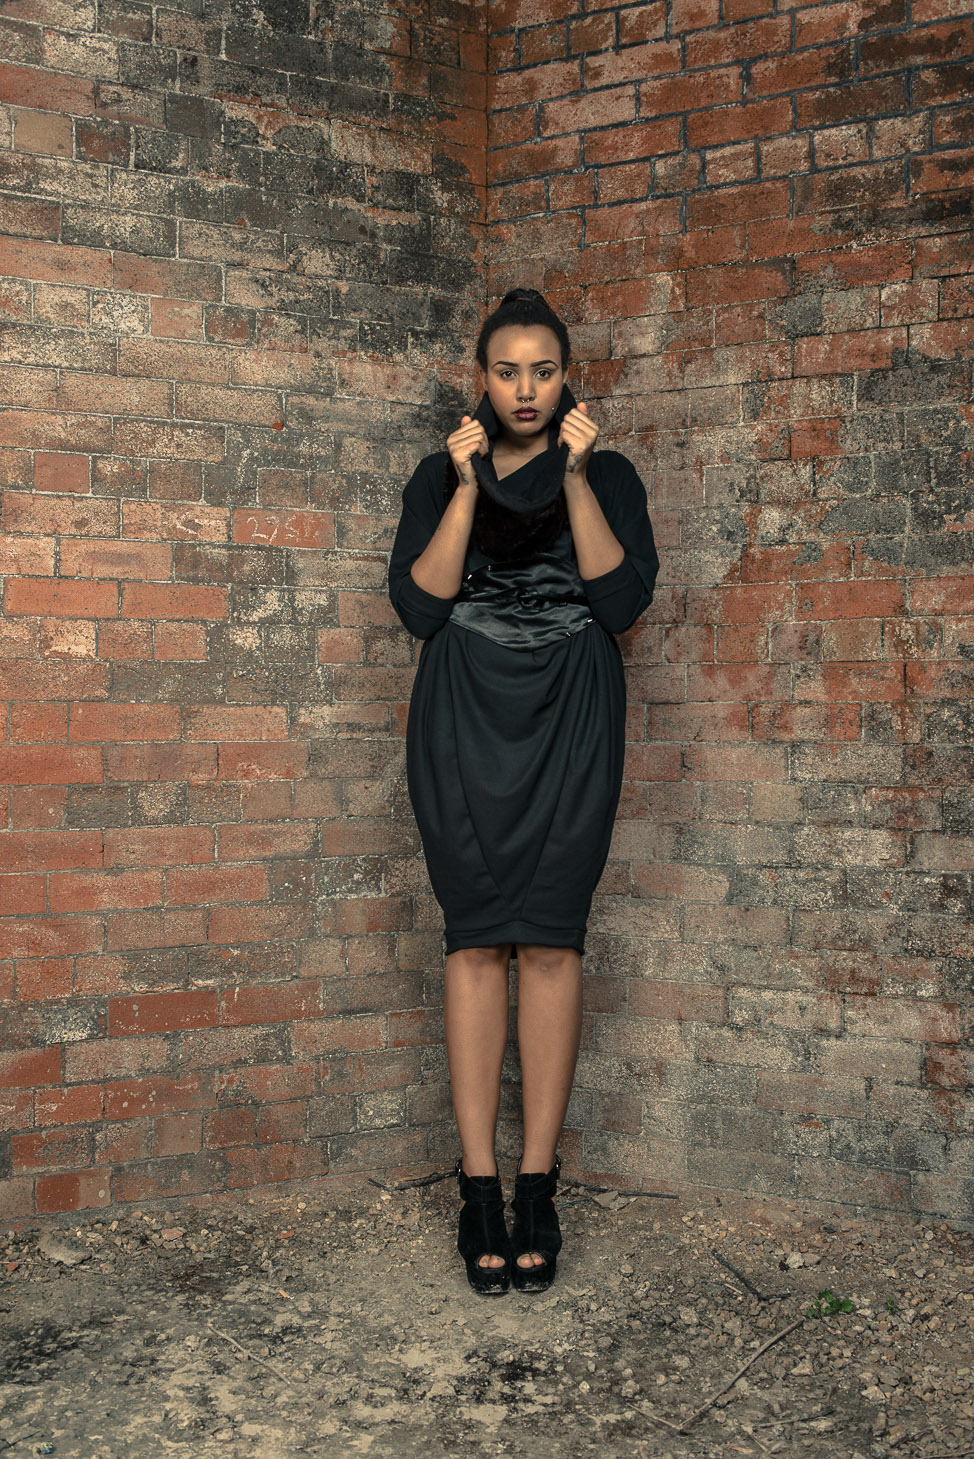 zaramia-ava-zaramiaava-leeds-fashion-designer-ethical-sustainable-tailored-minimalist-aya-dress-versatile-drape-black-belt-wrap-cowl-faux-fur-snood-styling-womenswear-models-photoshoot-location-19